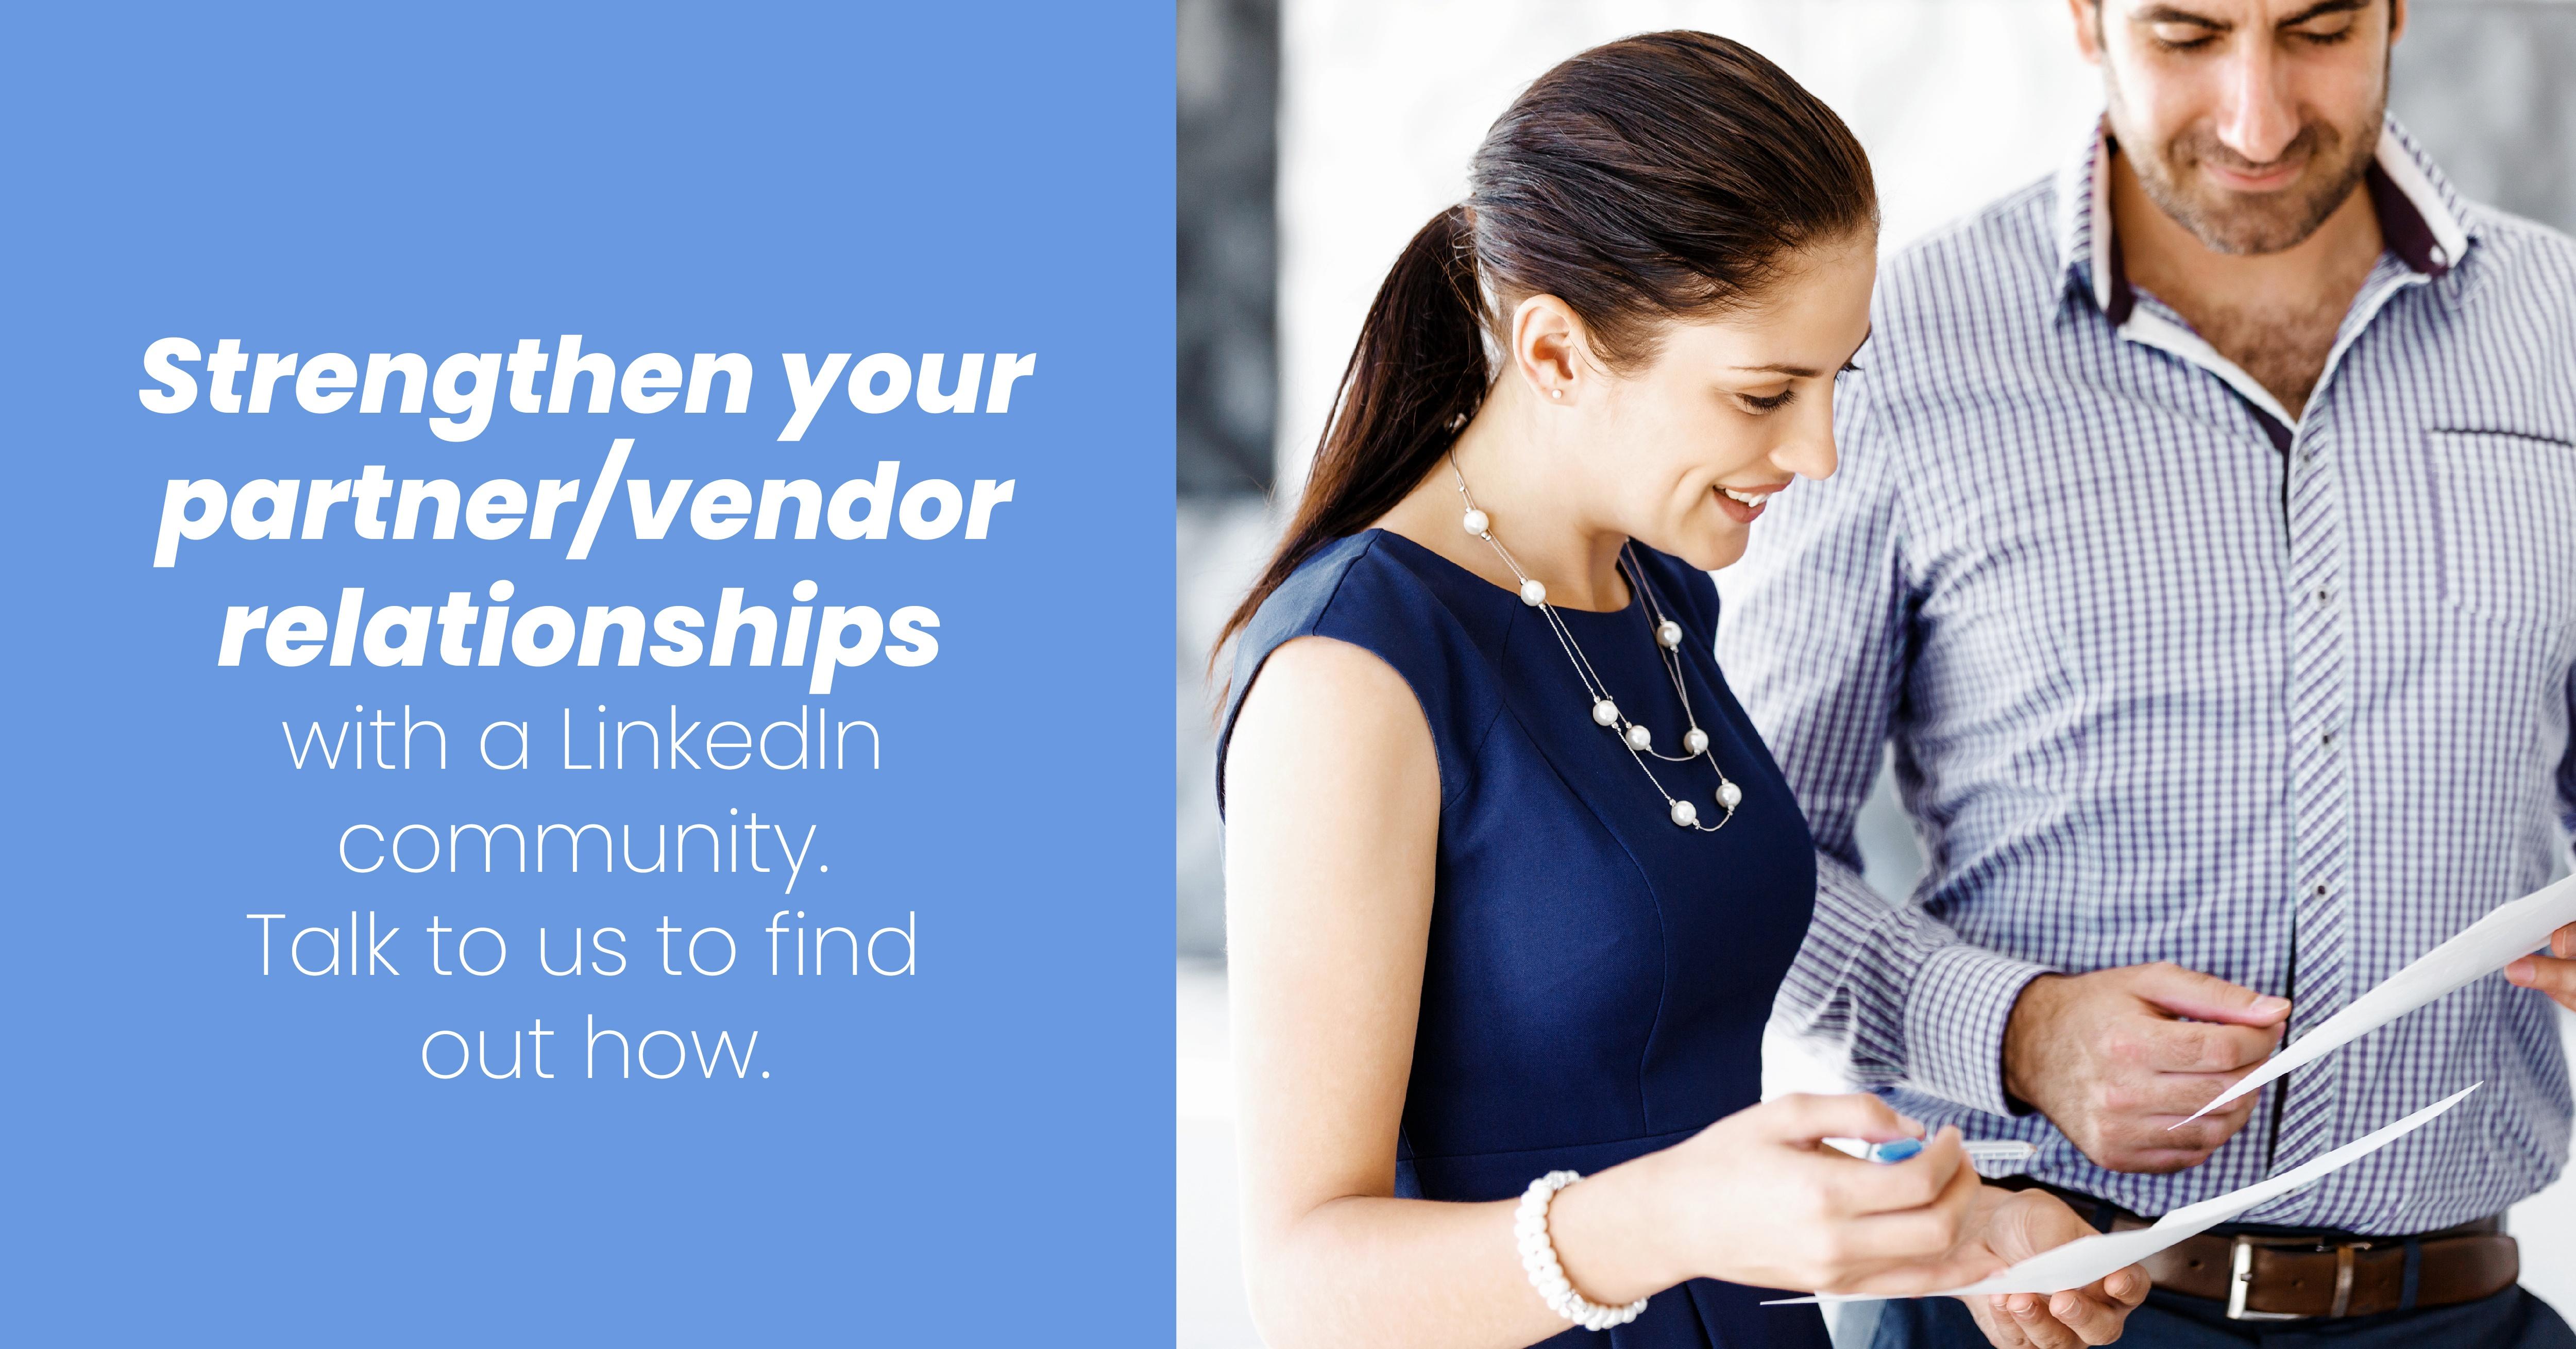 LinkedIn Community Ad